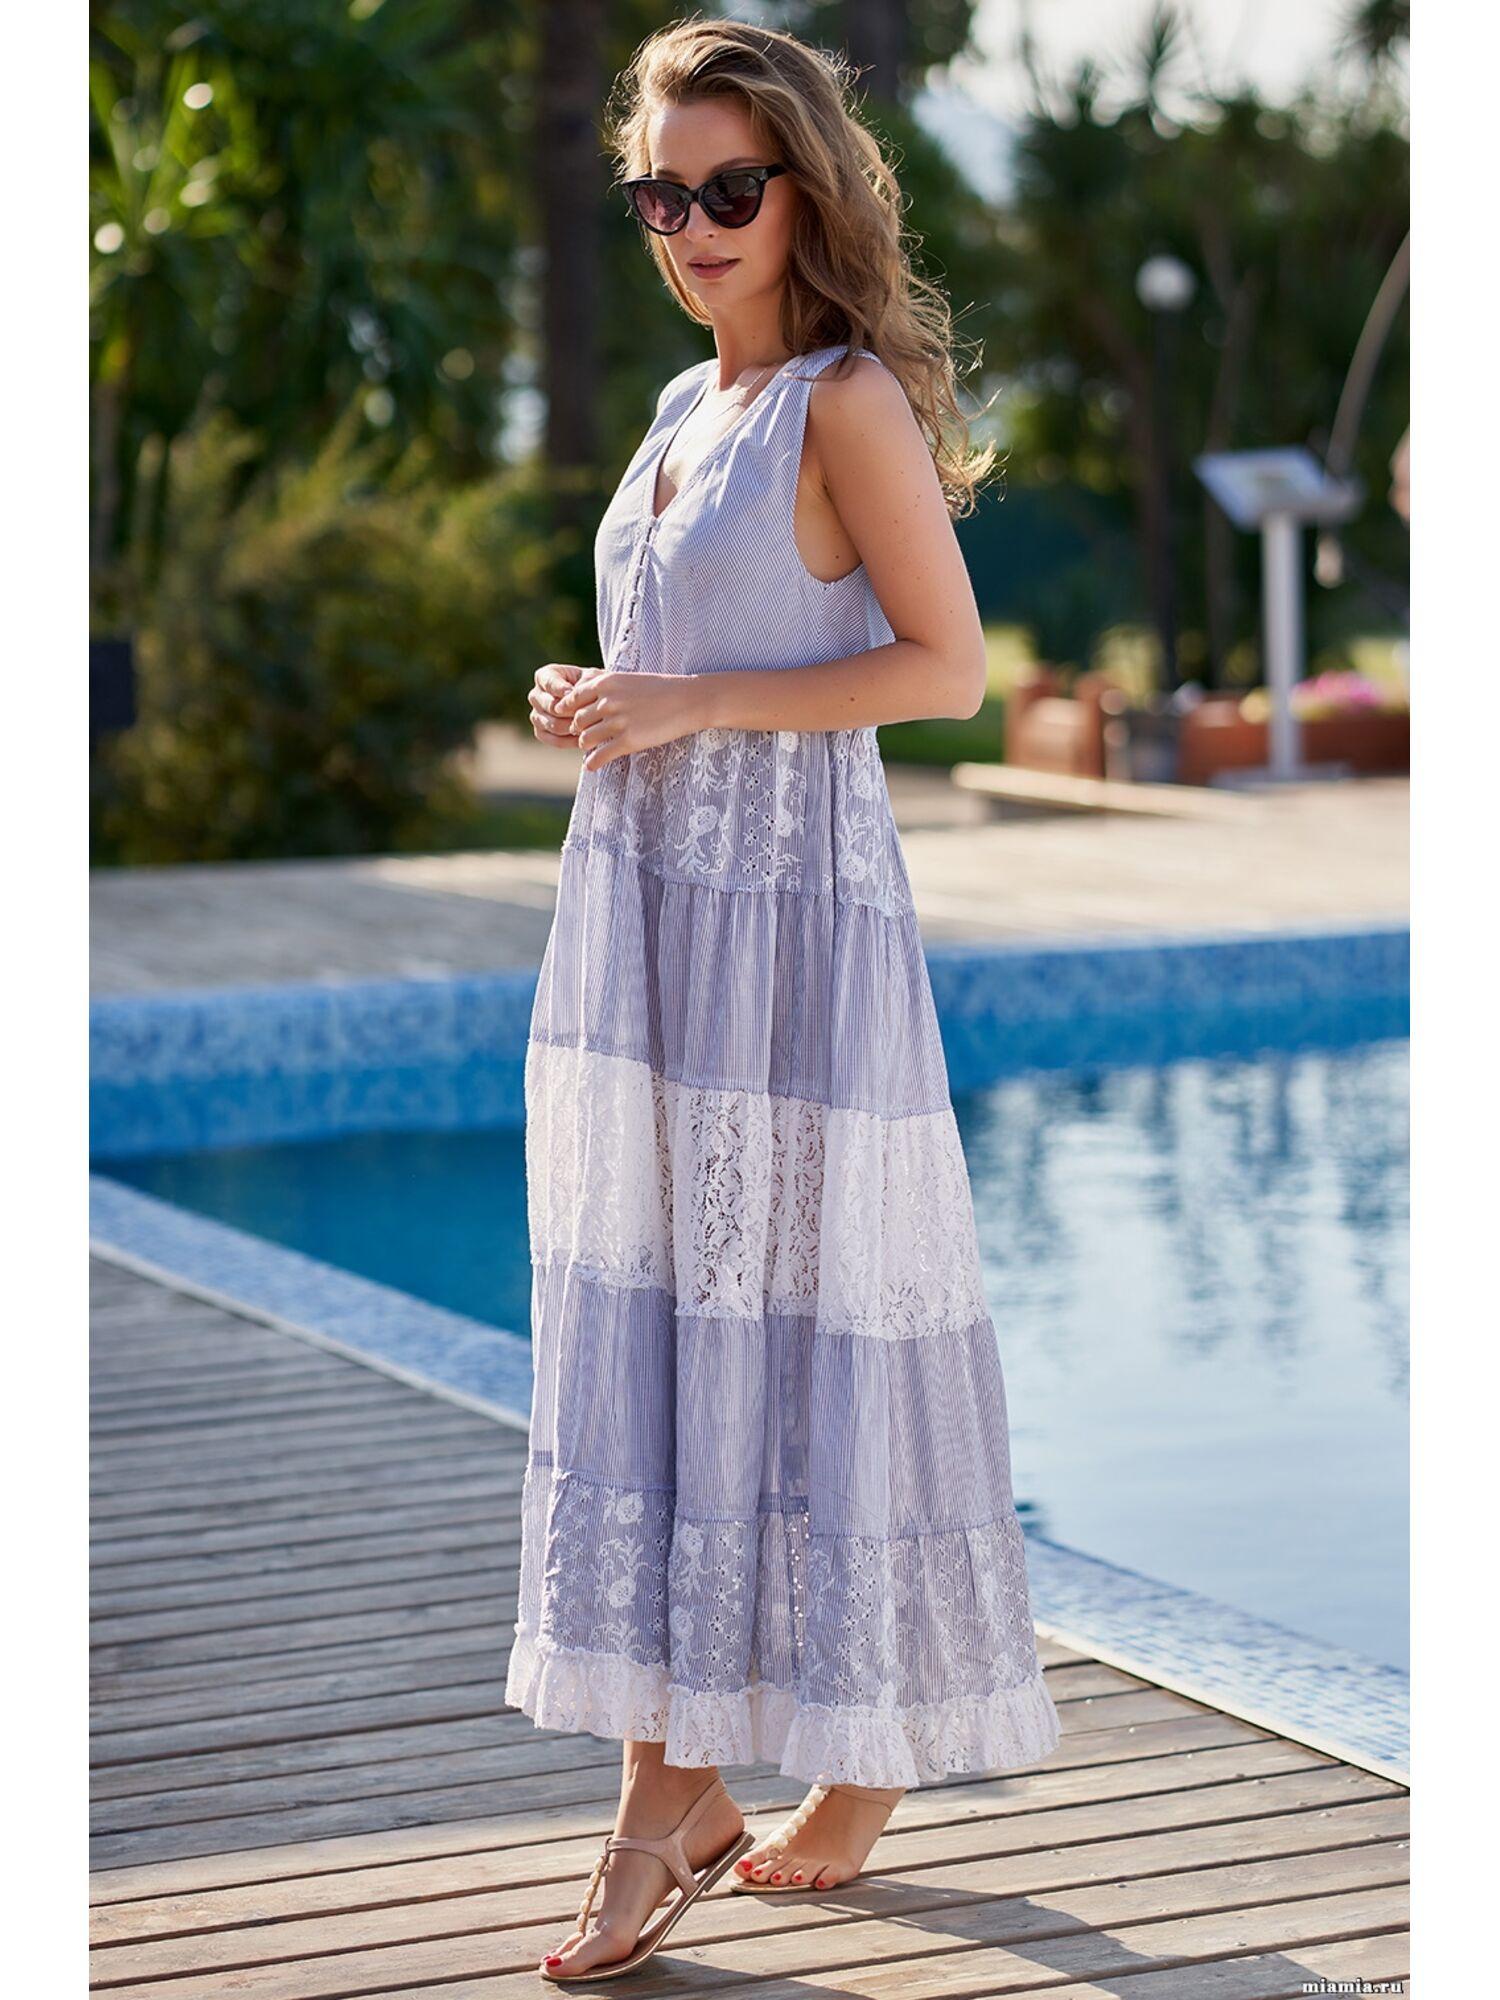 Сарафан, туника пляжная хлопковая Доминикана 1414, голубой, Mia-Amore